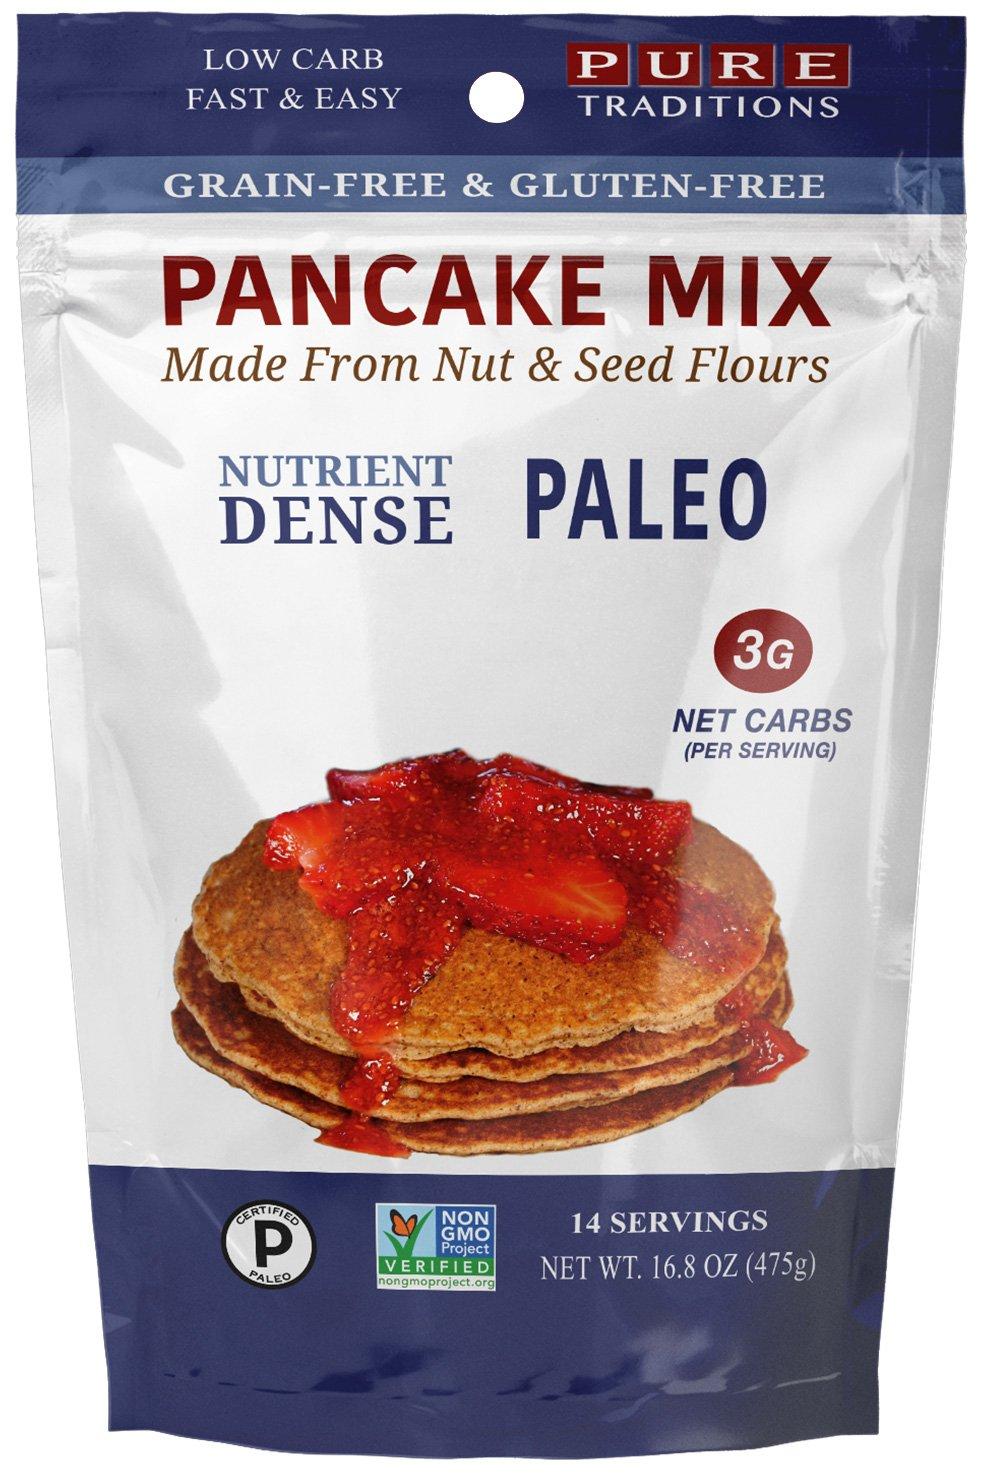 Certified Paleo Pancake Mix, Gluten & Grain Free - 16.8 Oz (14 Serving)